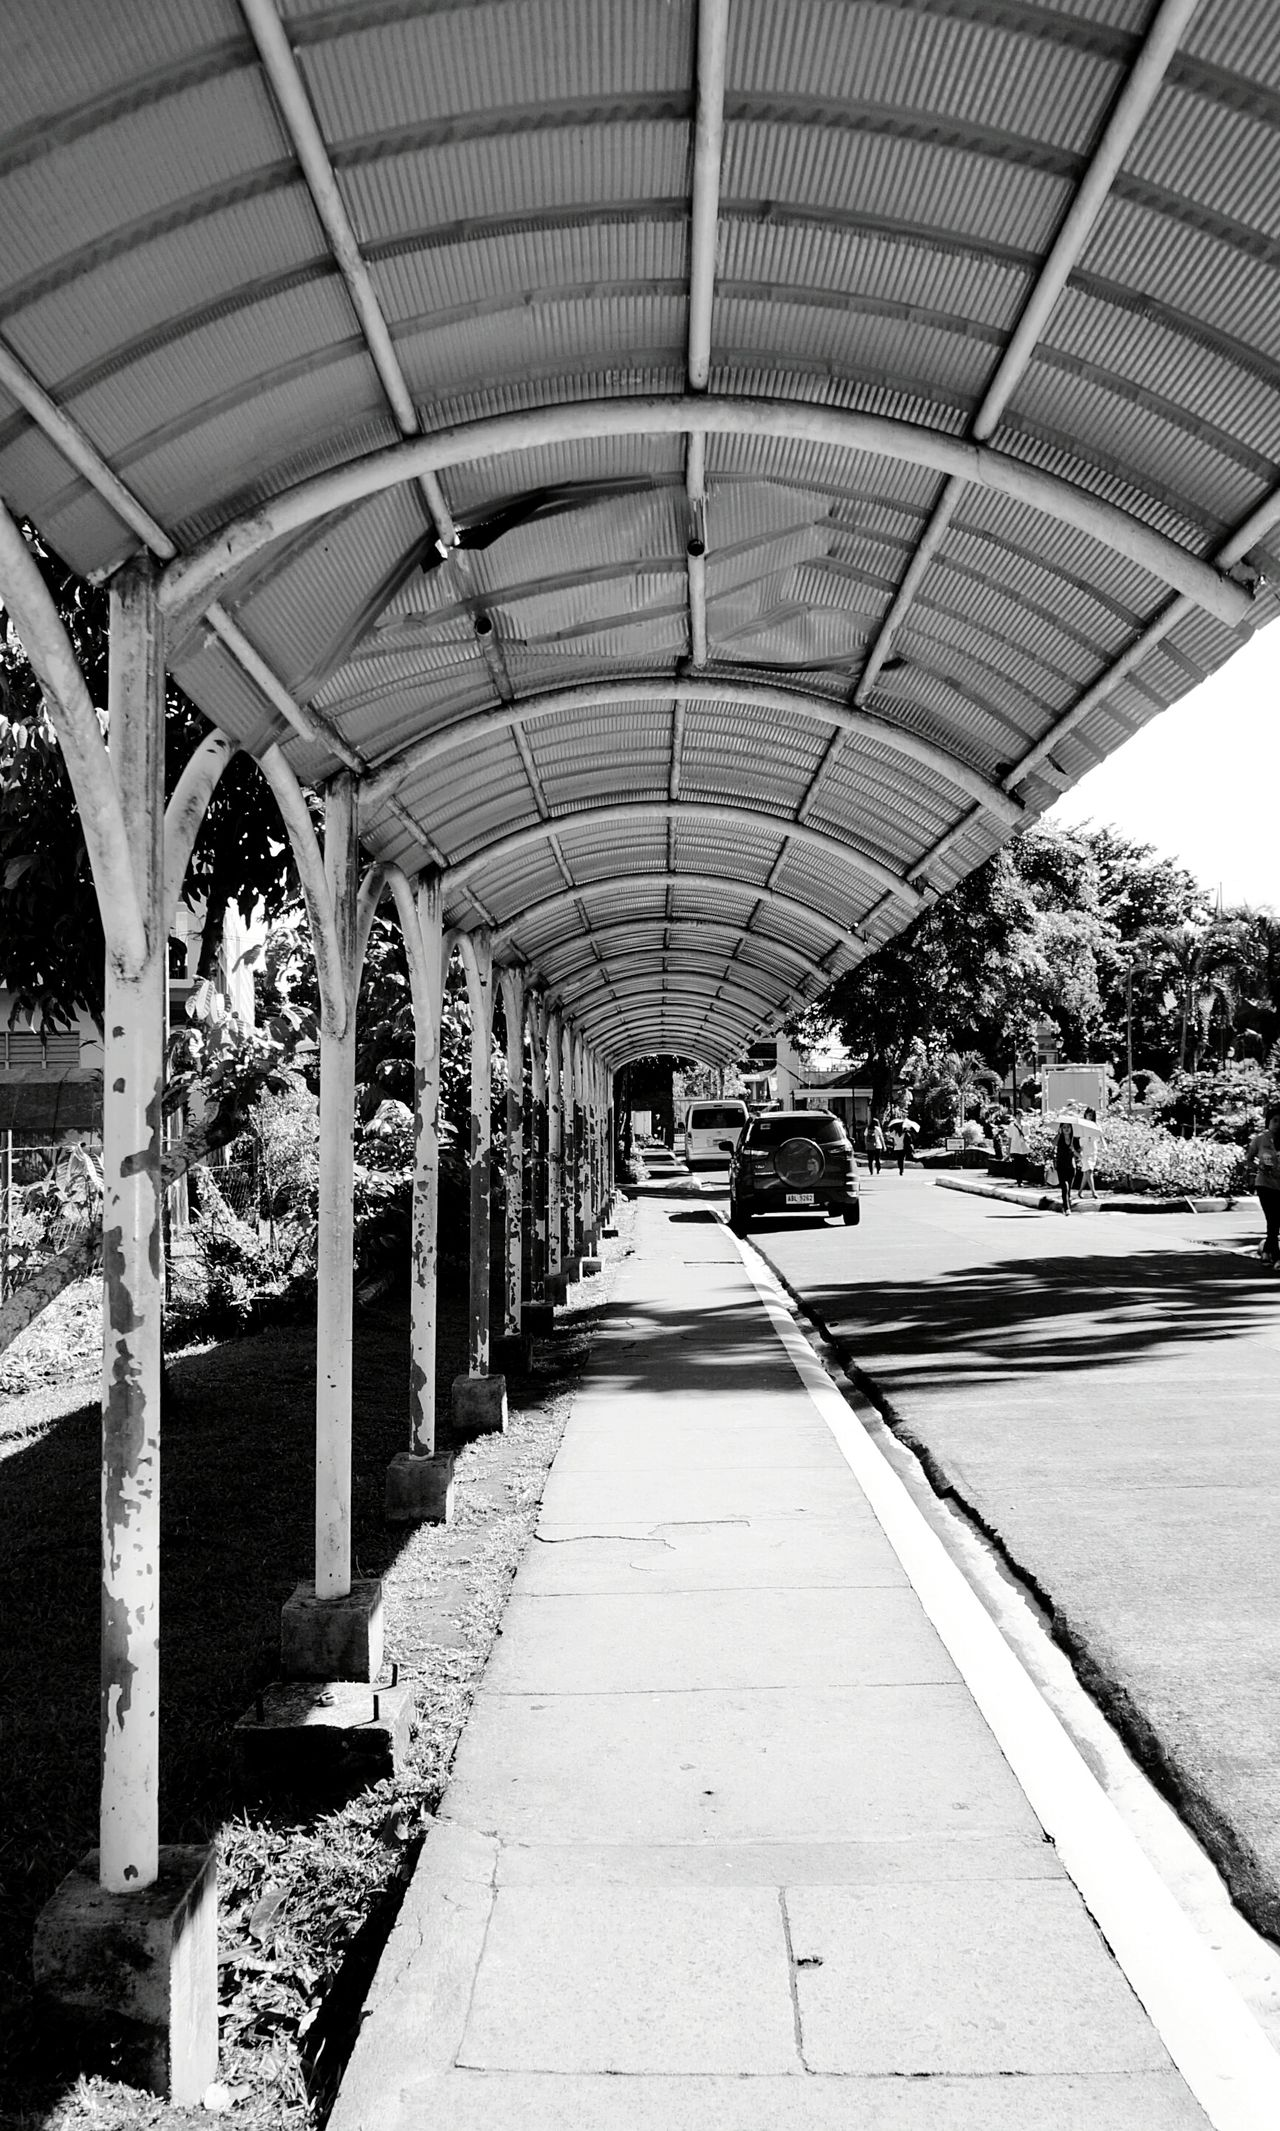 Walkway. Bicol University Daraga, Albay Philippines EyeEm Gallery University Campus EyeEm Best Shots Eye4photography  Eyeem Philippines The Week On EyeEm Deceptively Simple Landscapes With WhiteWall